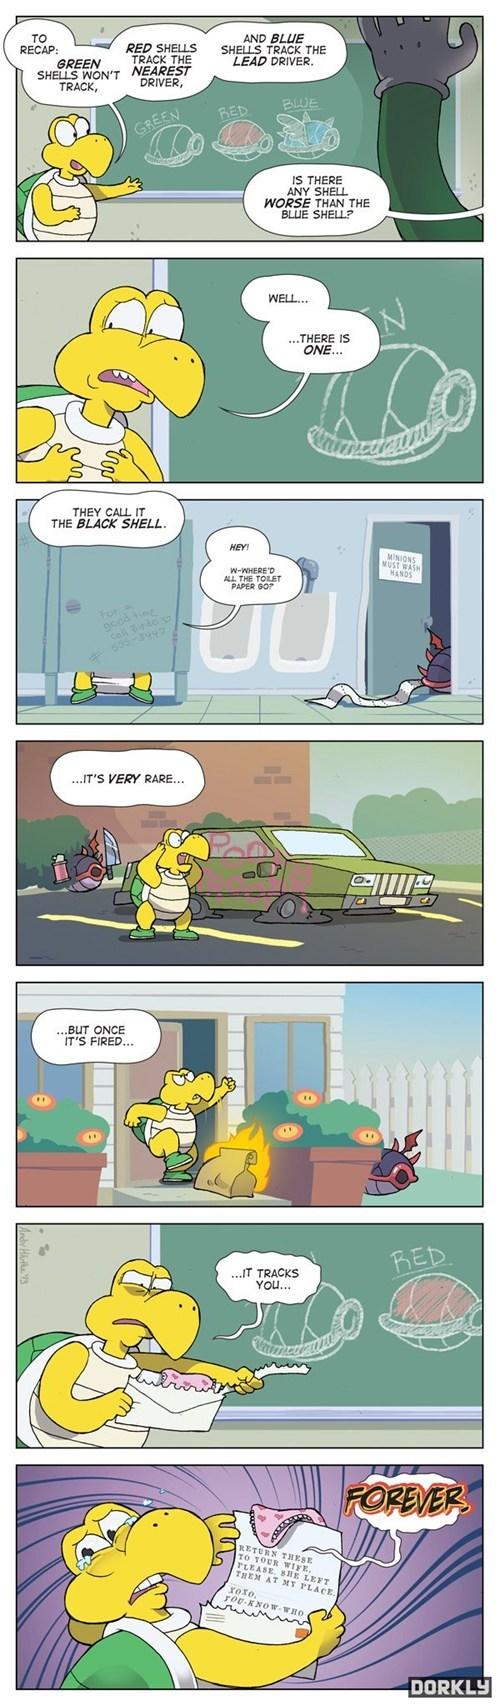 dorkly,Mario Kart,comics